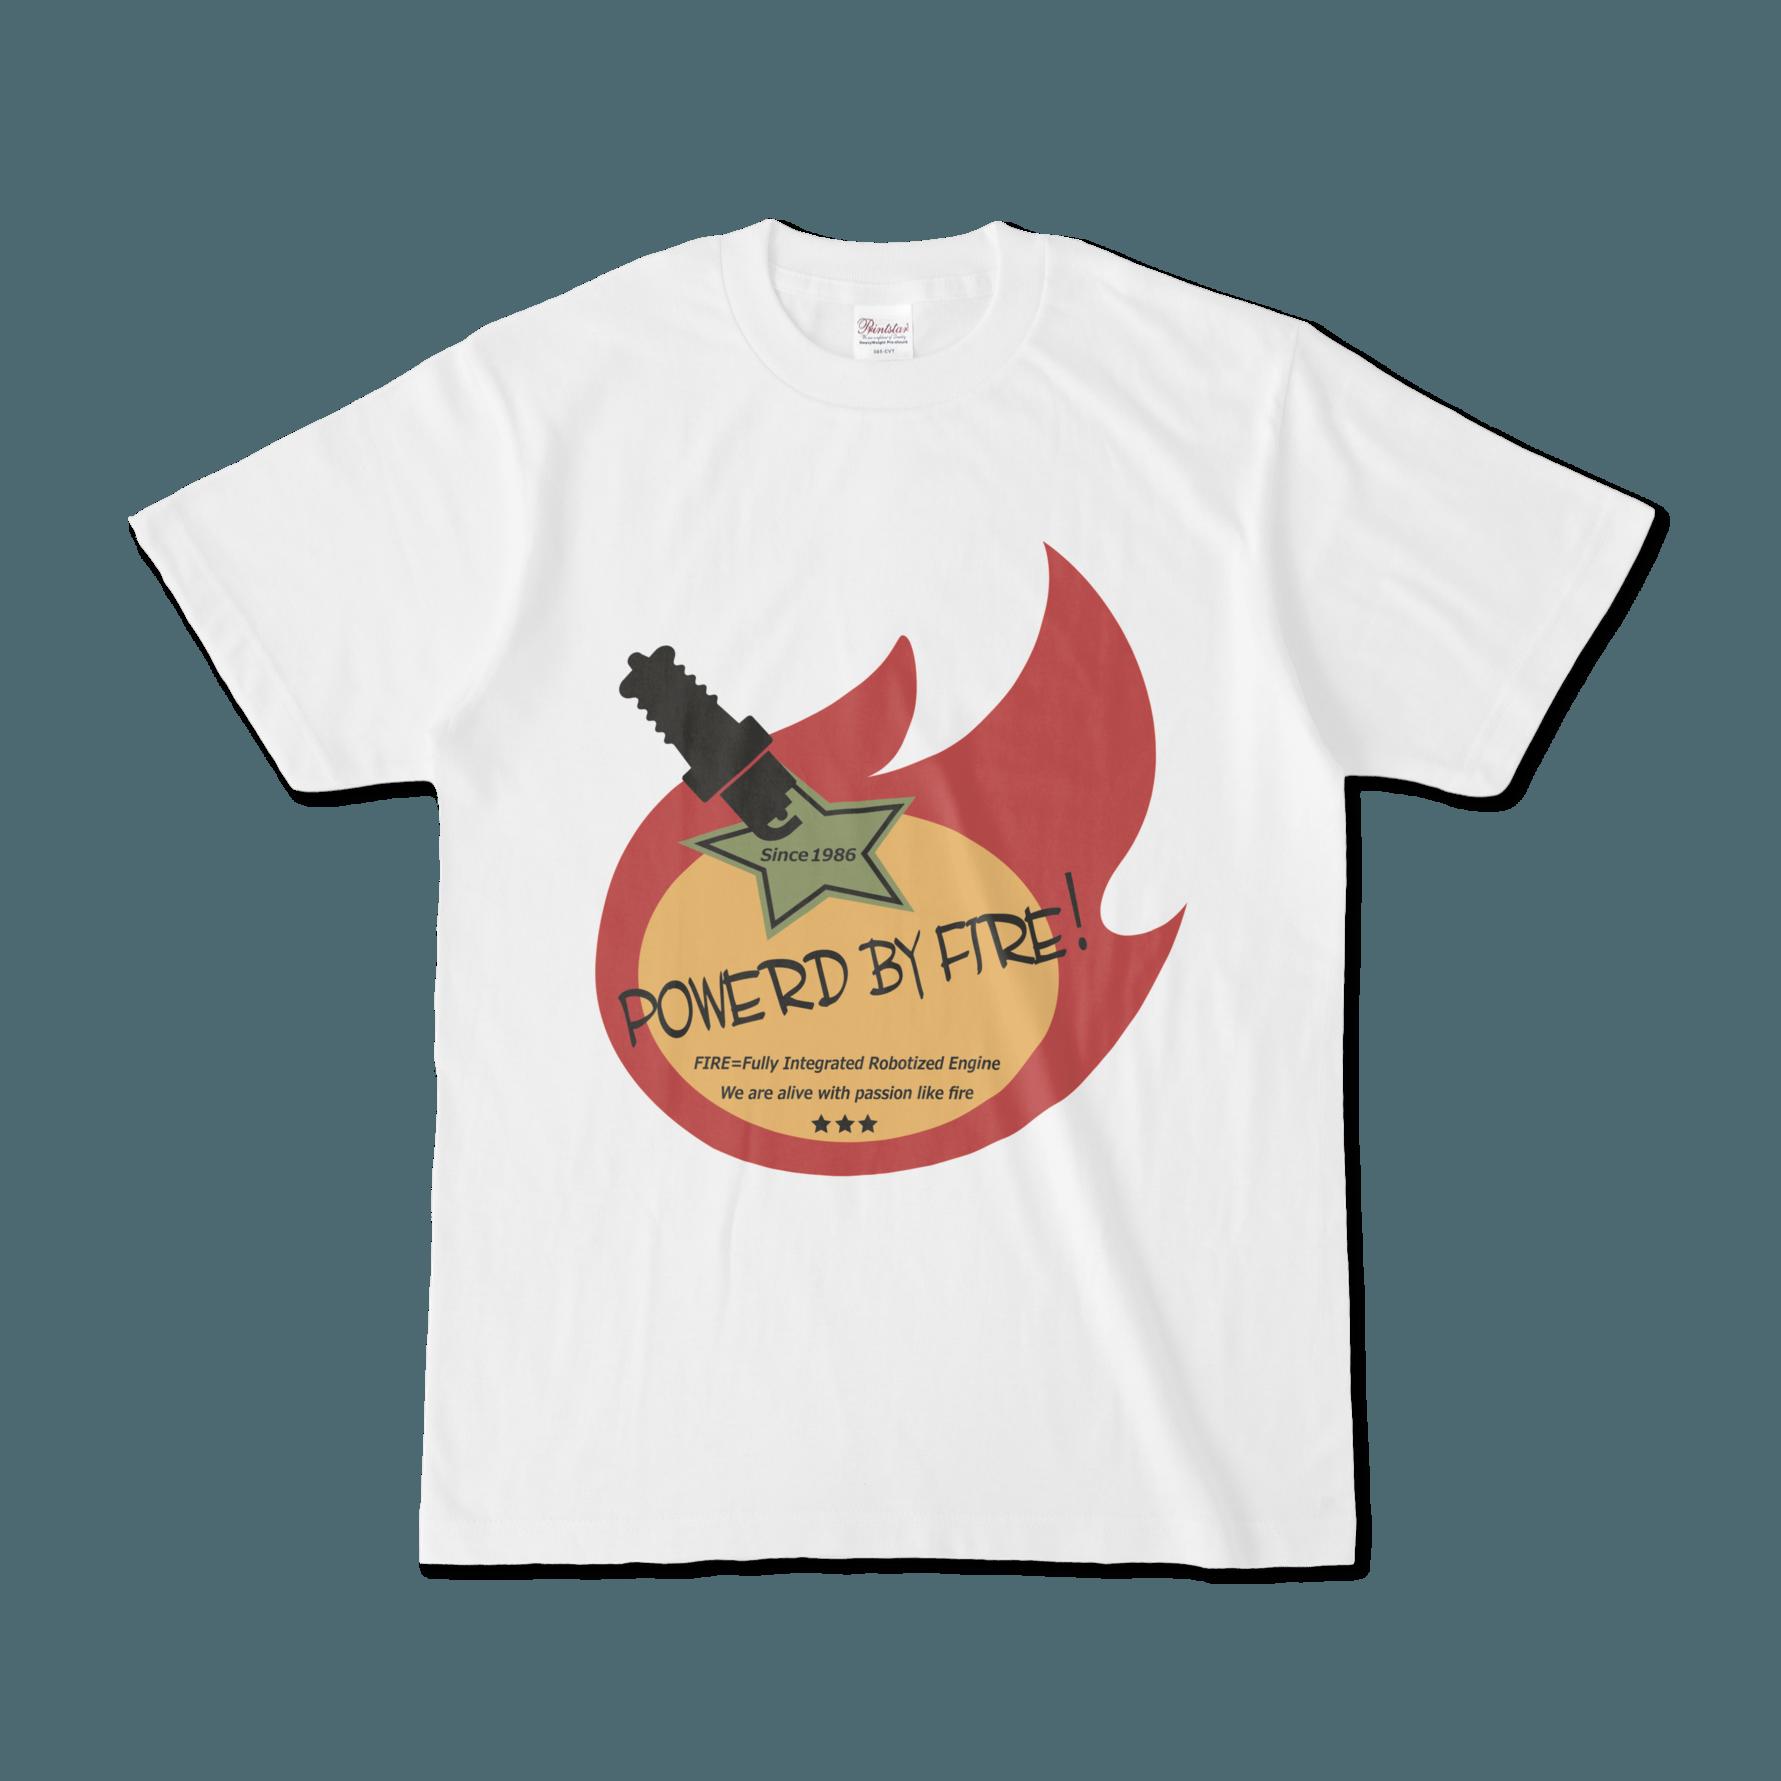 Powerd by fire デザインTシャツ(トリコクラシコ)